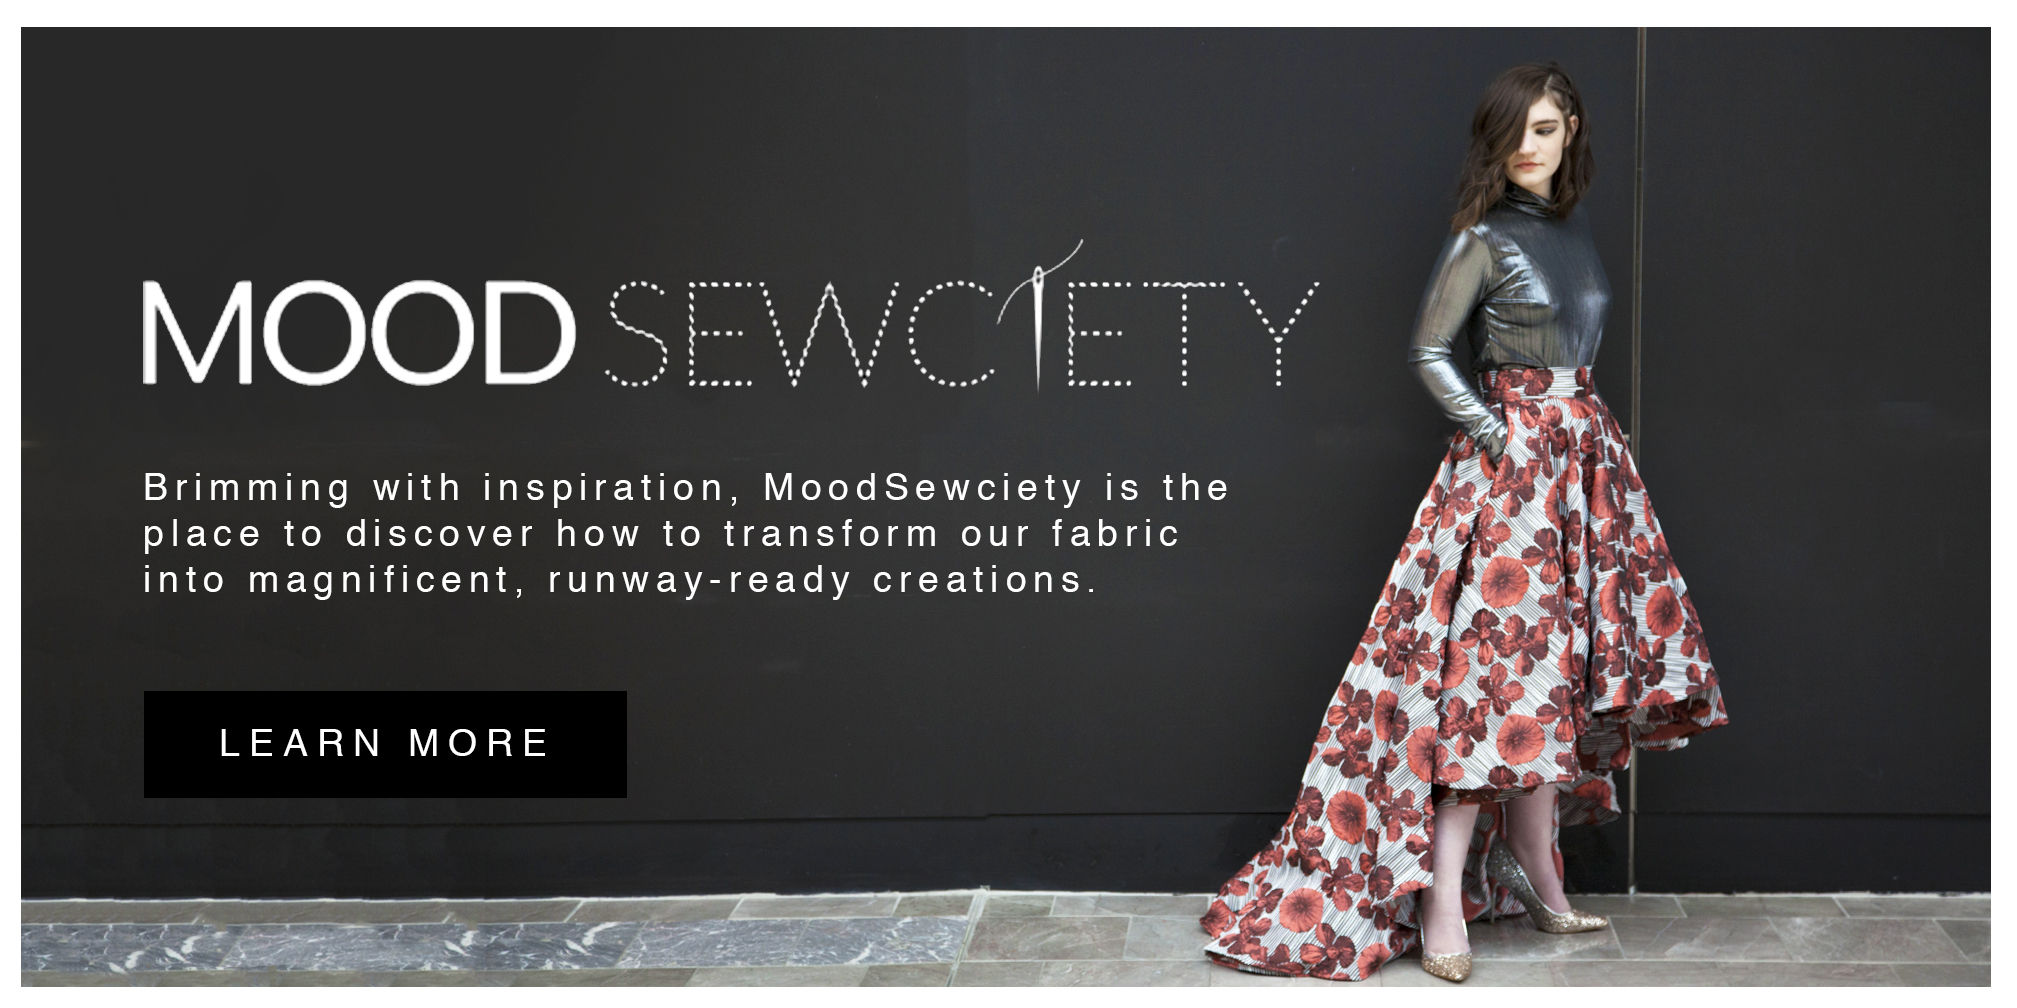 Mood Sewcity